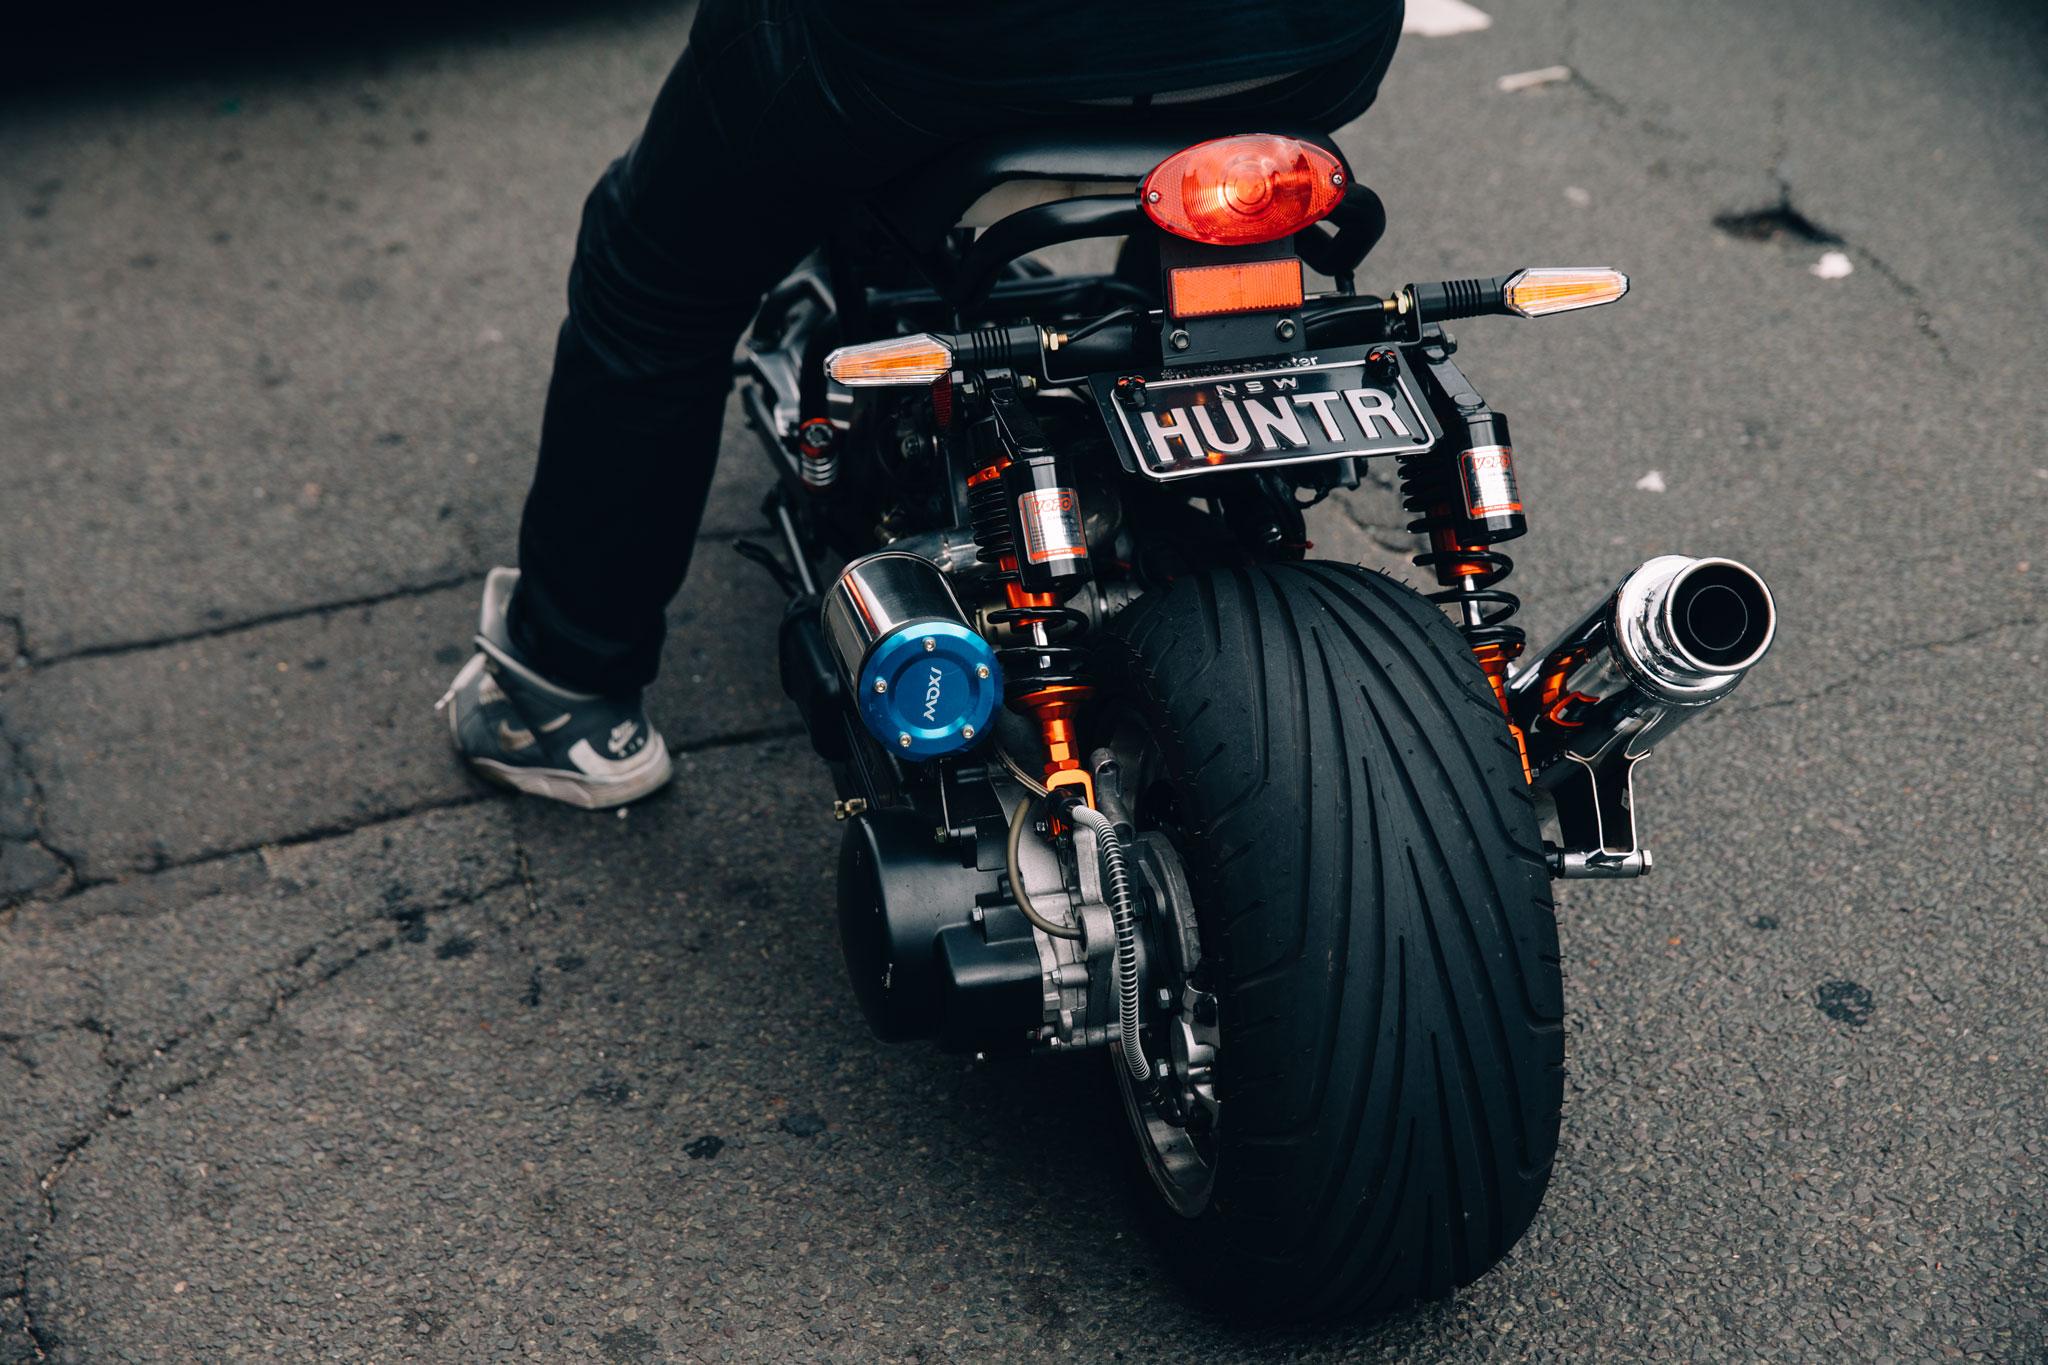 Hunter_Scooter_0624.jpg